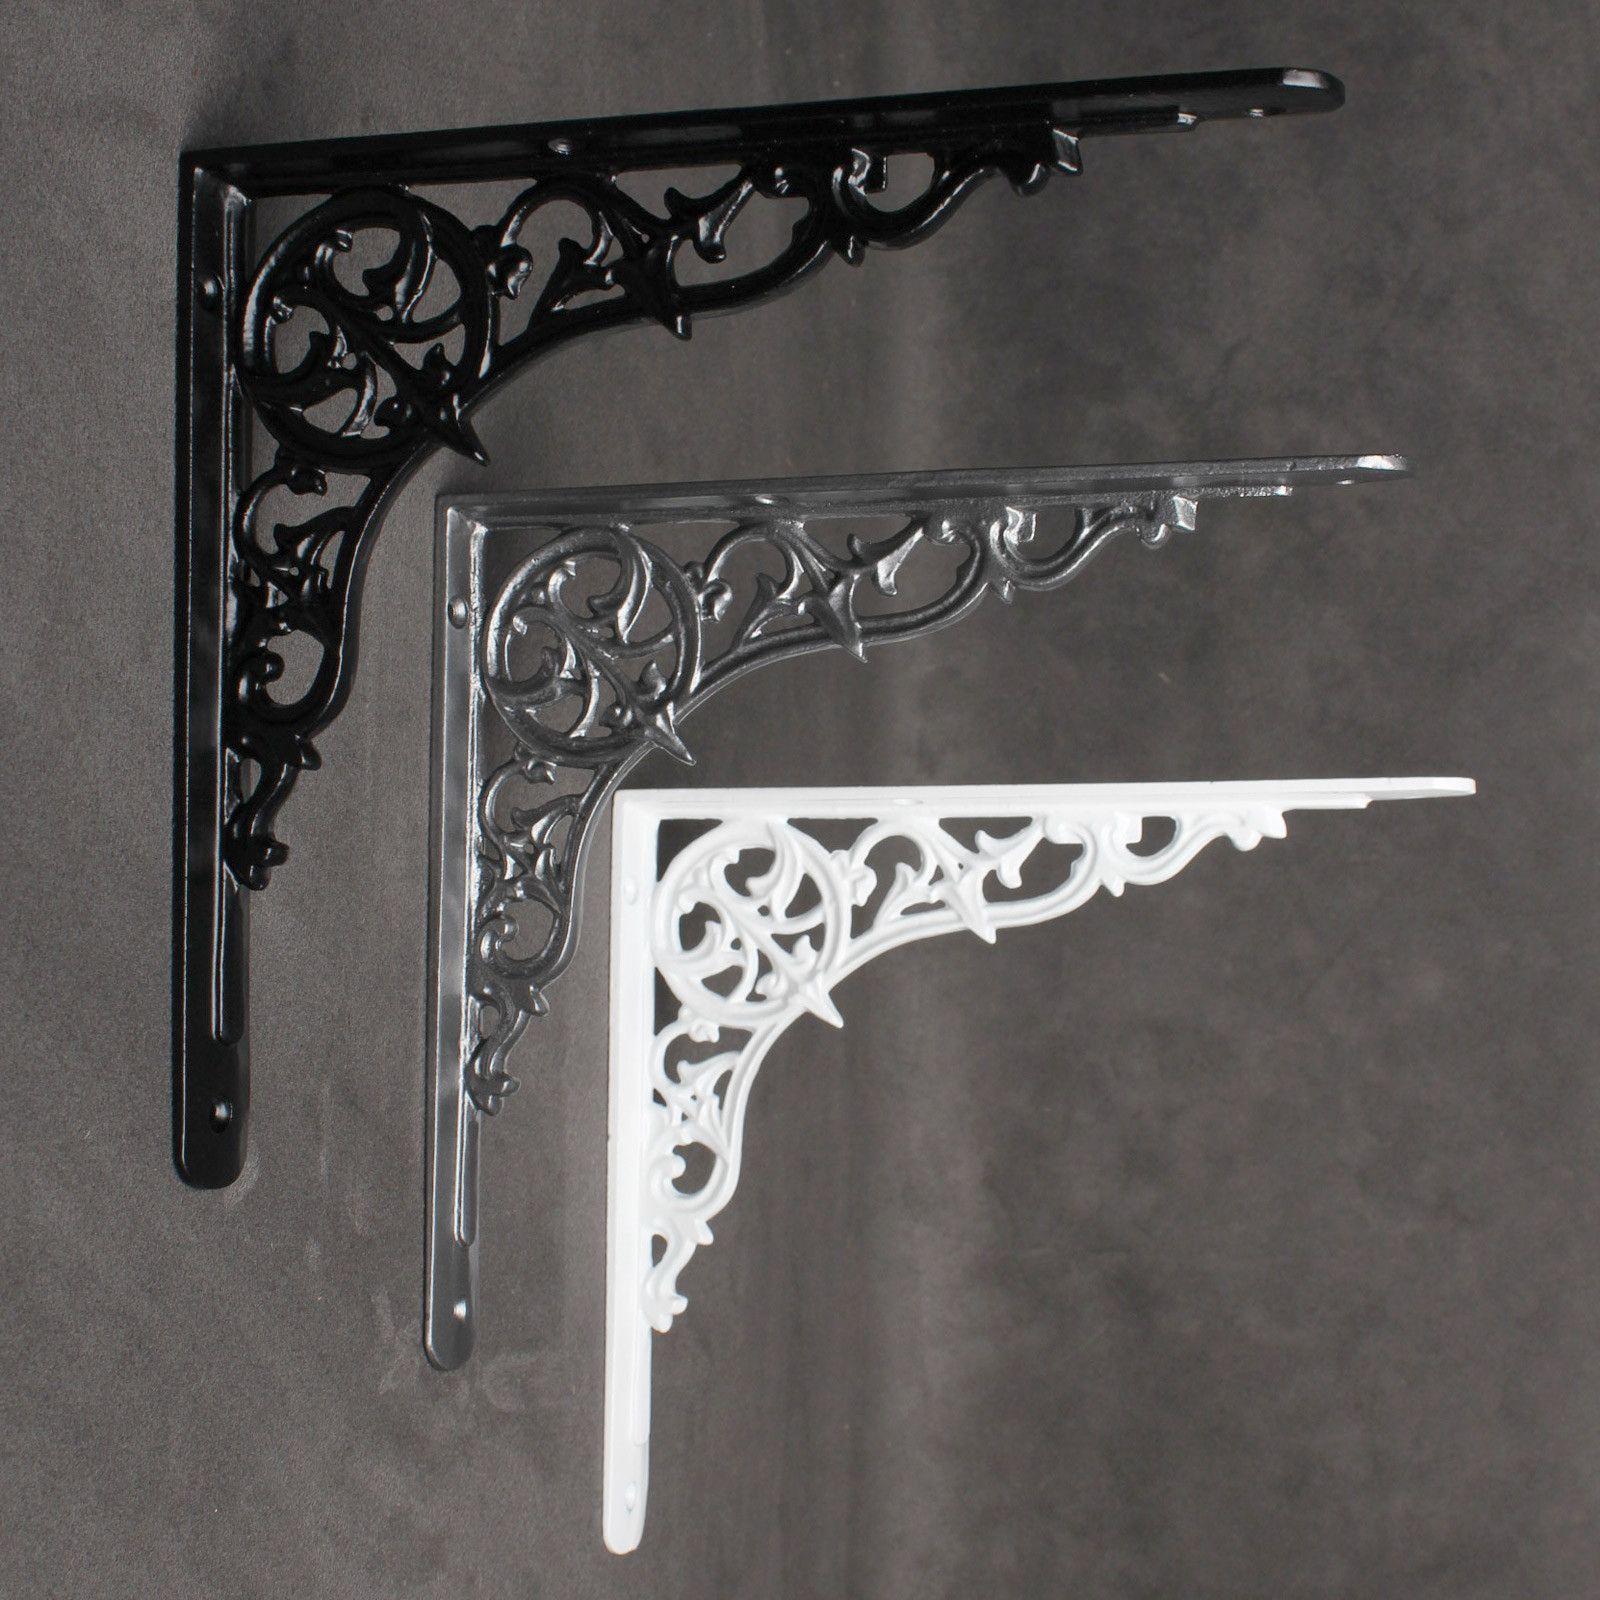 Antique Vintage Shelf Bracket Cast Iron Metal Victorian Design Heavy Duty 5 Inch